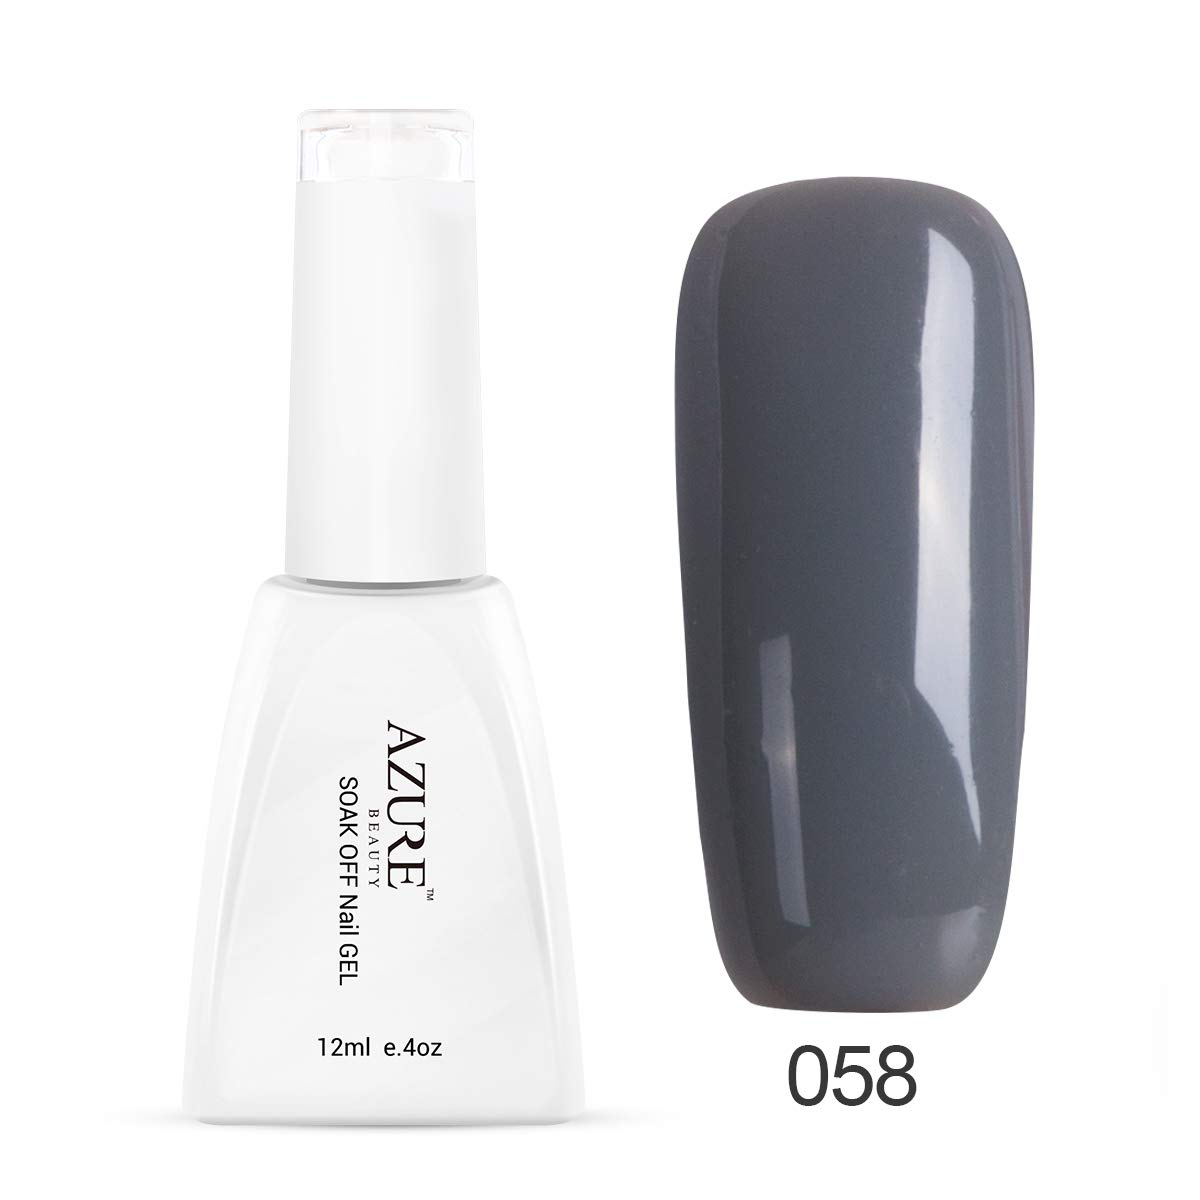 Azure Beauty Gel Polish 12ml Guangzhou seedear trade co. ltd.